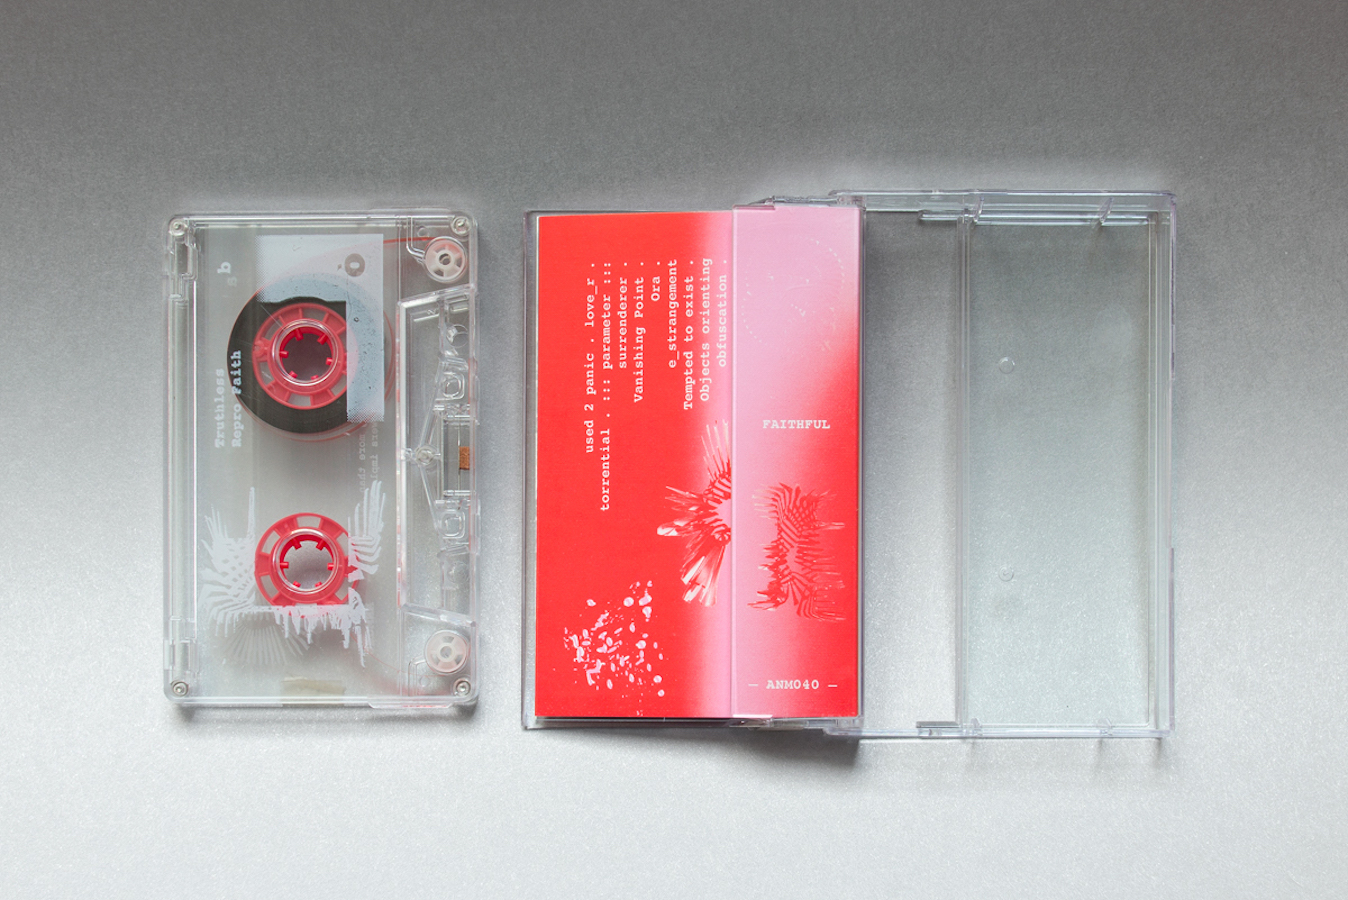 ANM40-03